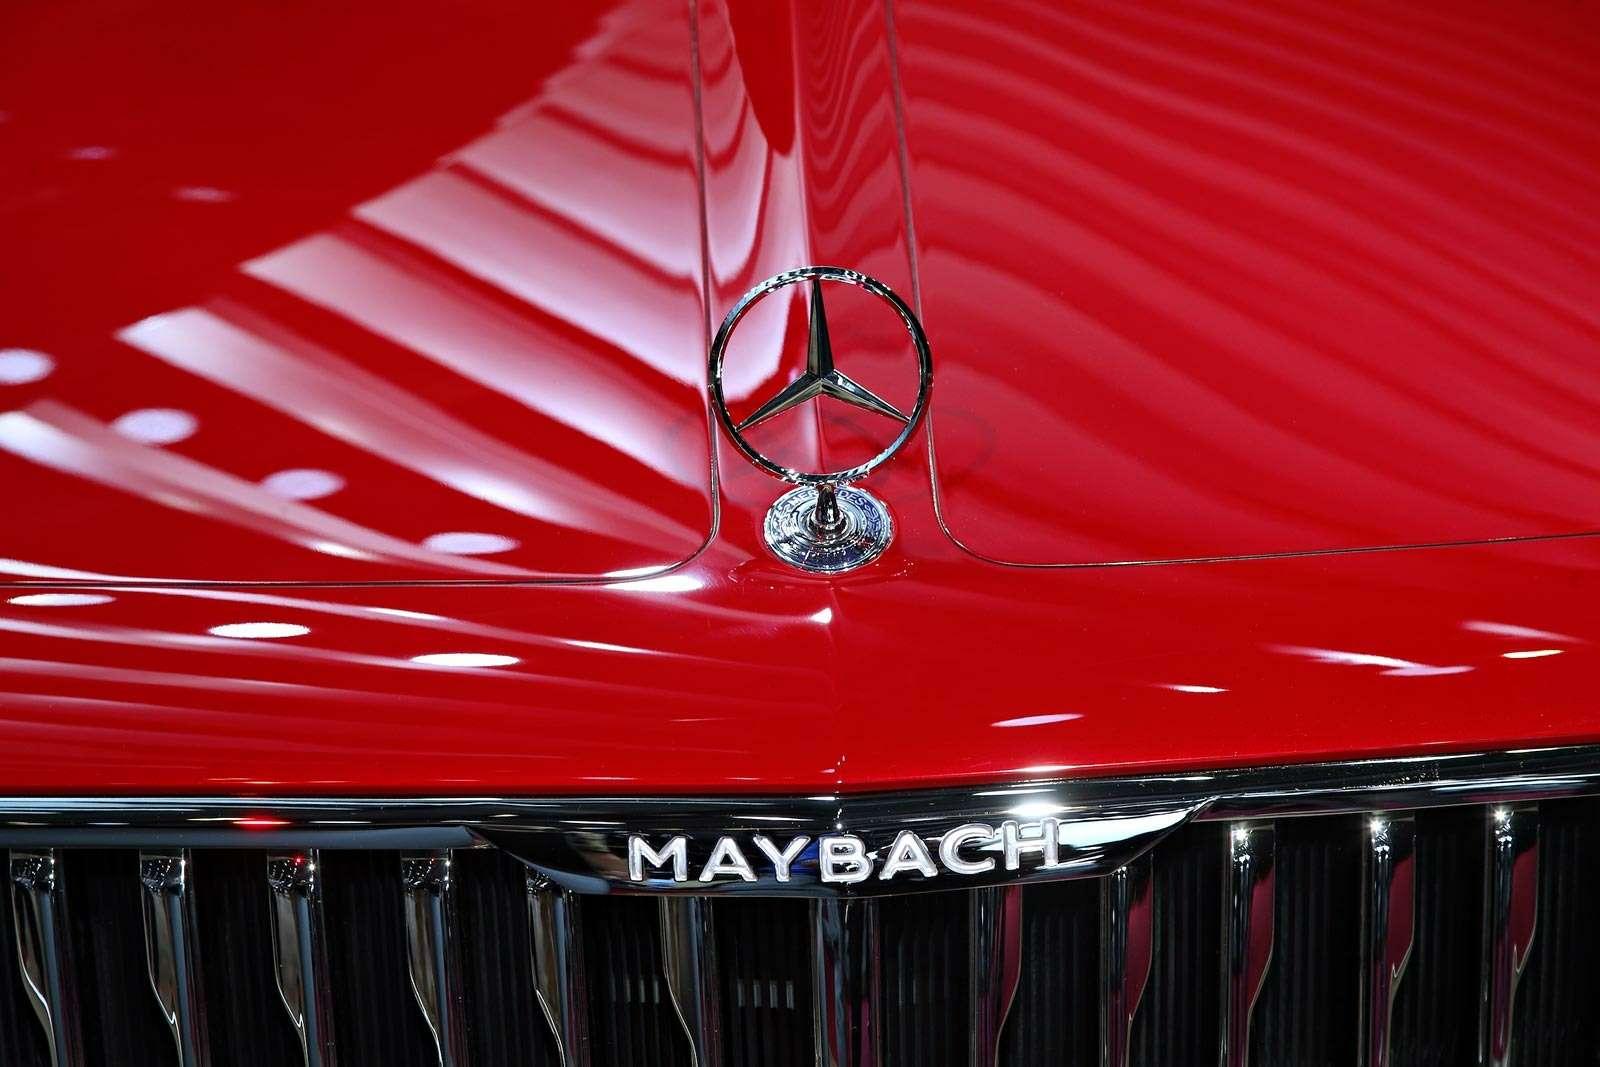 Самый красивый автомобиль Парижа: Vision Mercedes-Maybach 6завоевывает сердца— фото 643572